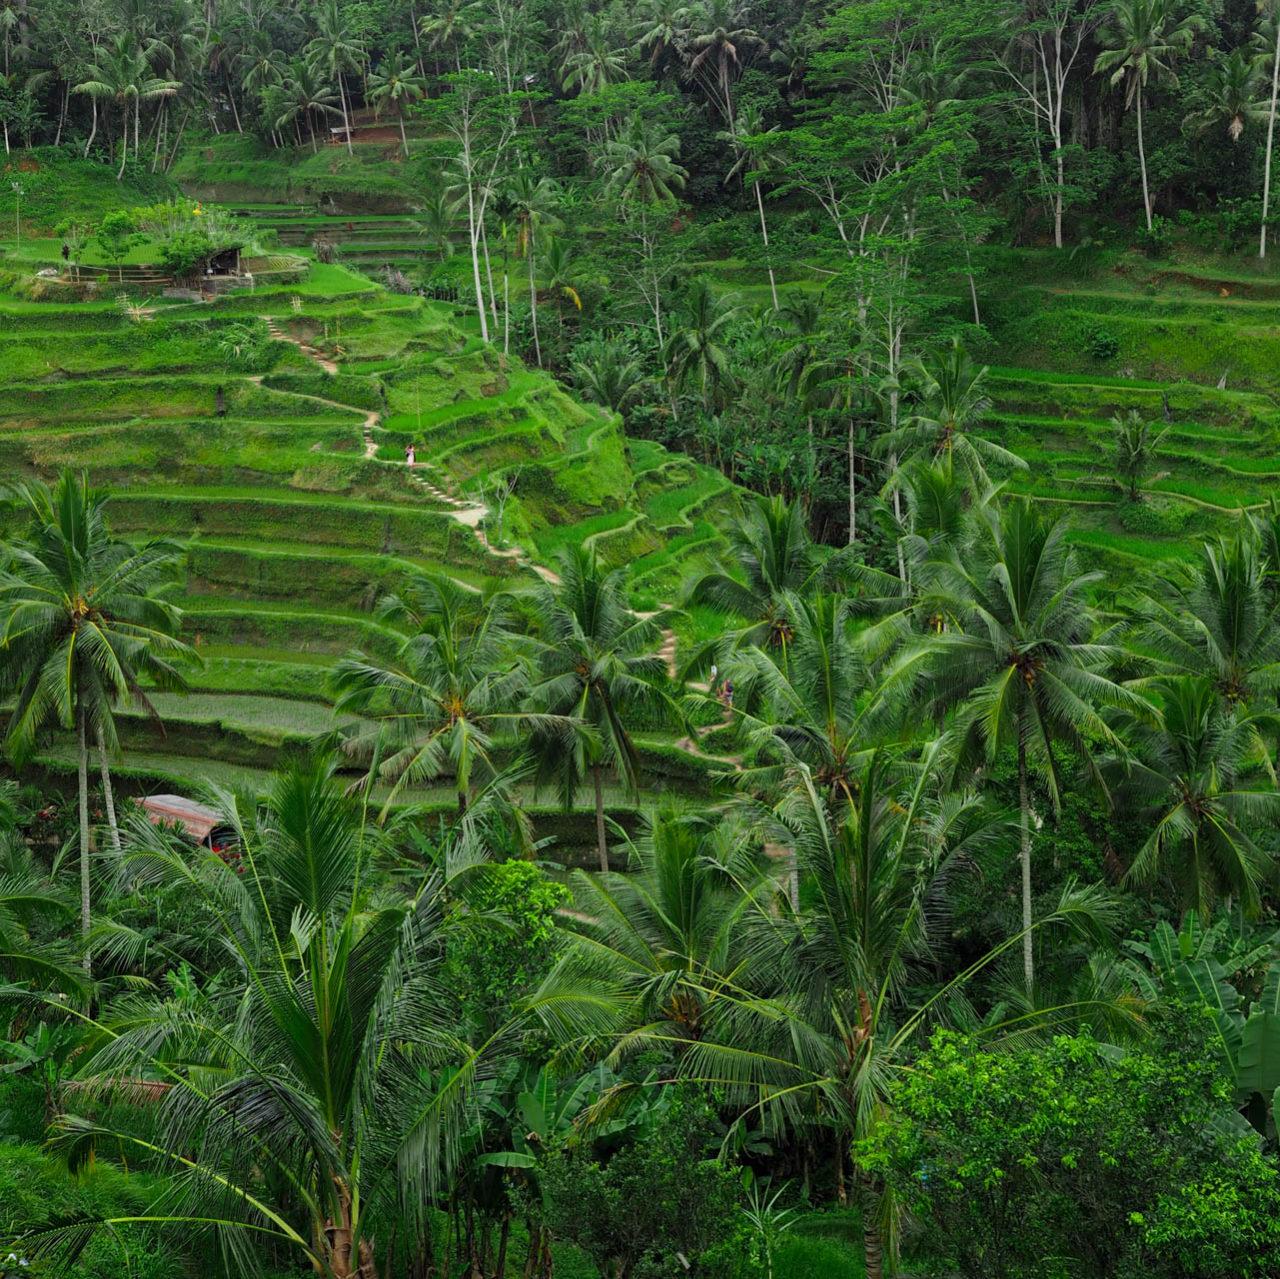 tegalalang-rice-terrace-ubud-bali-3